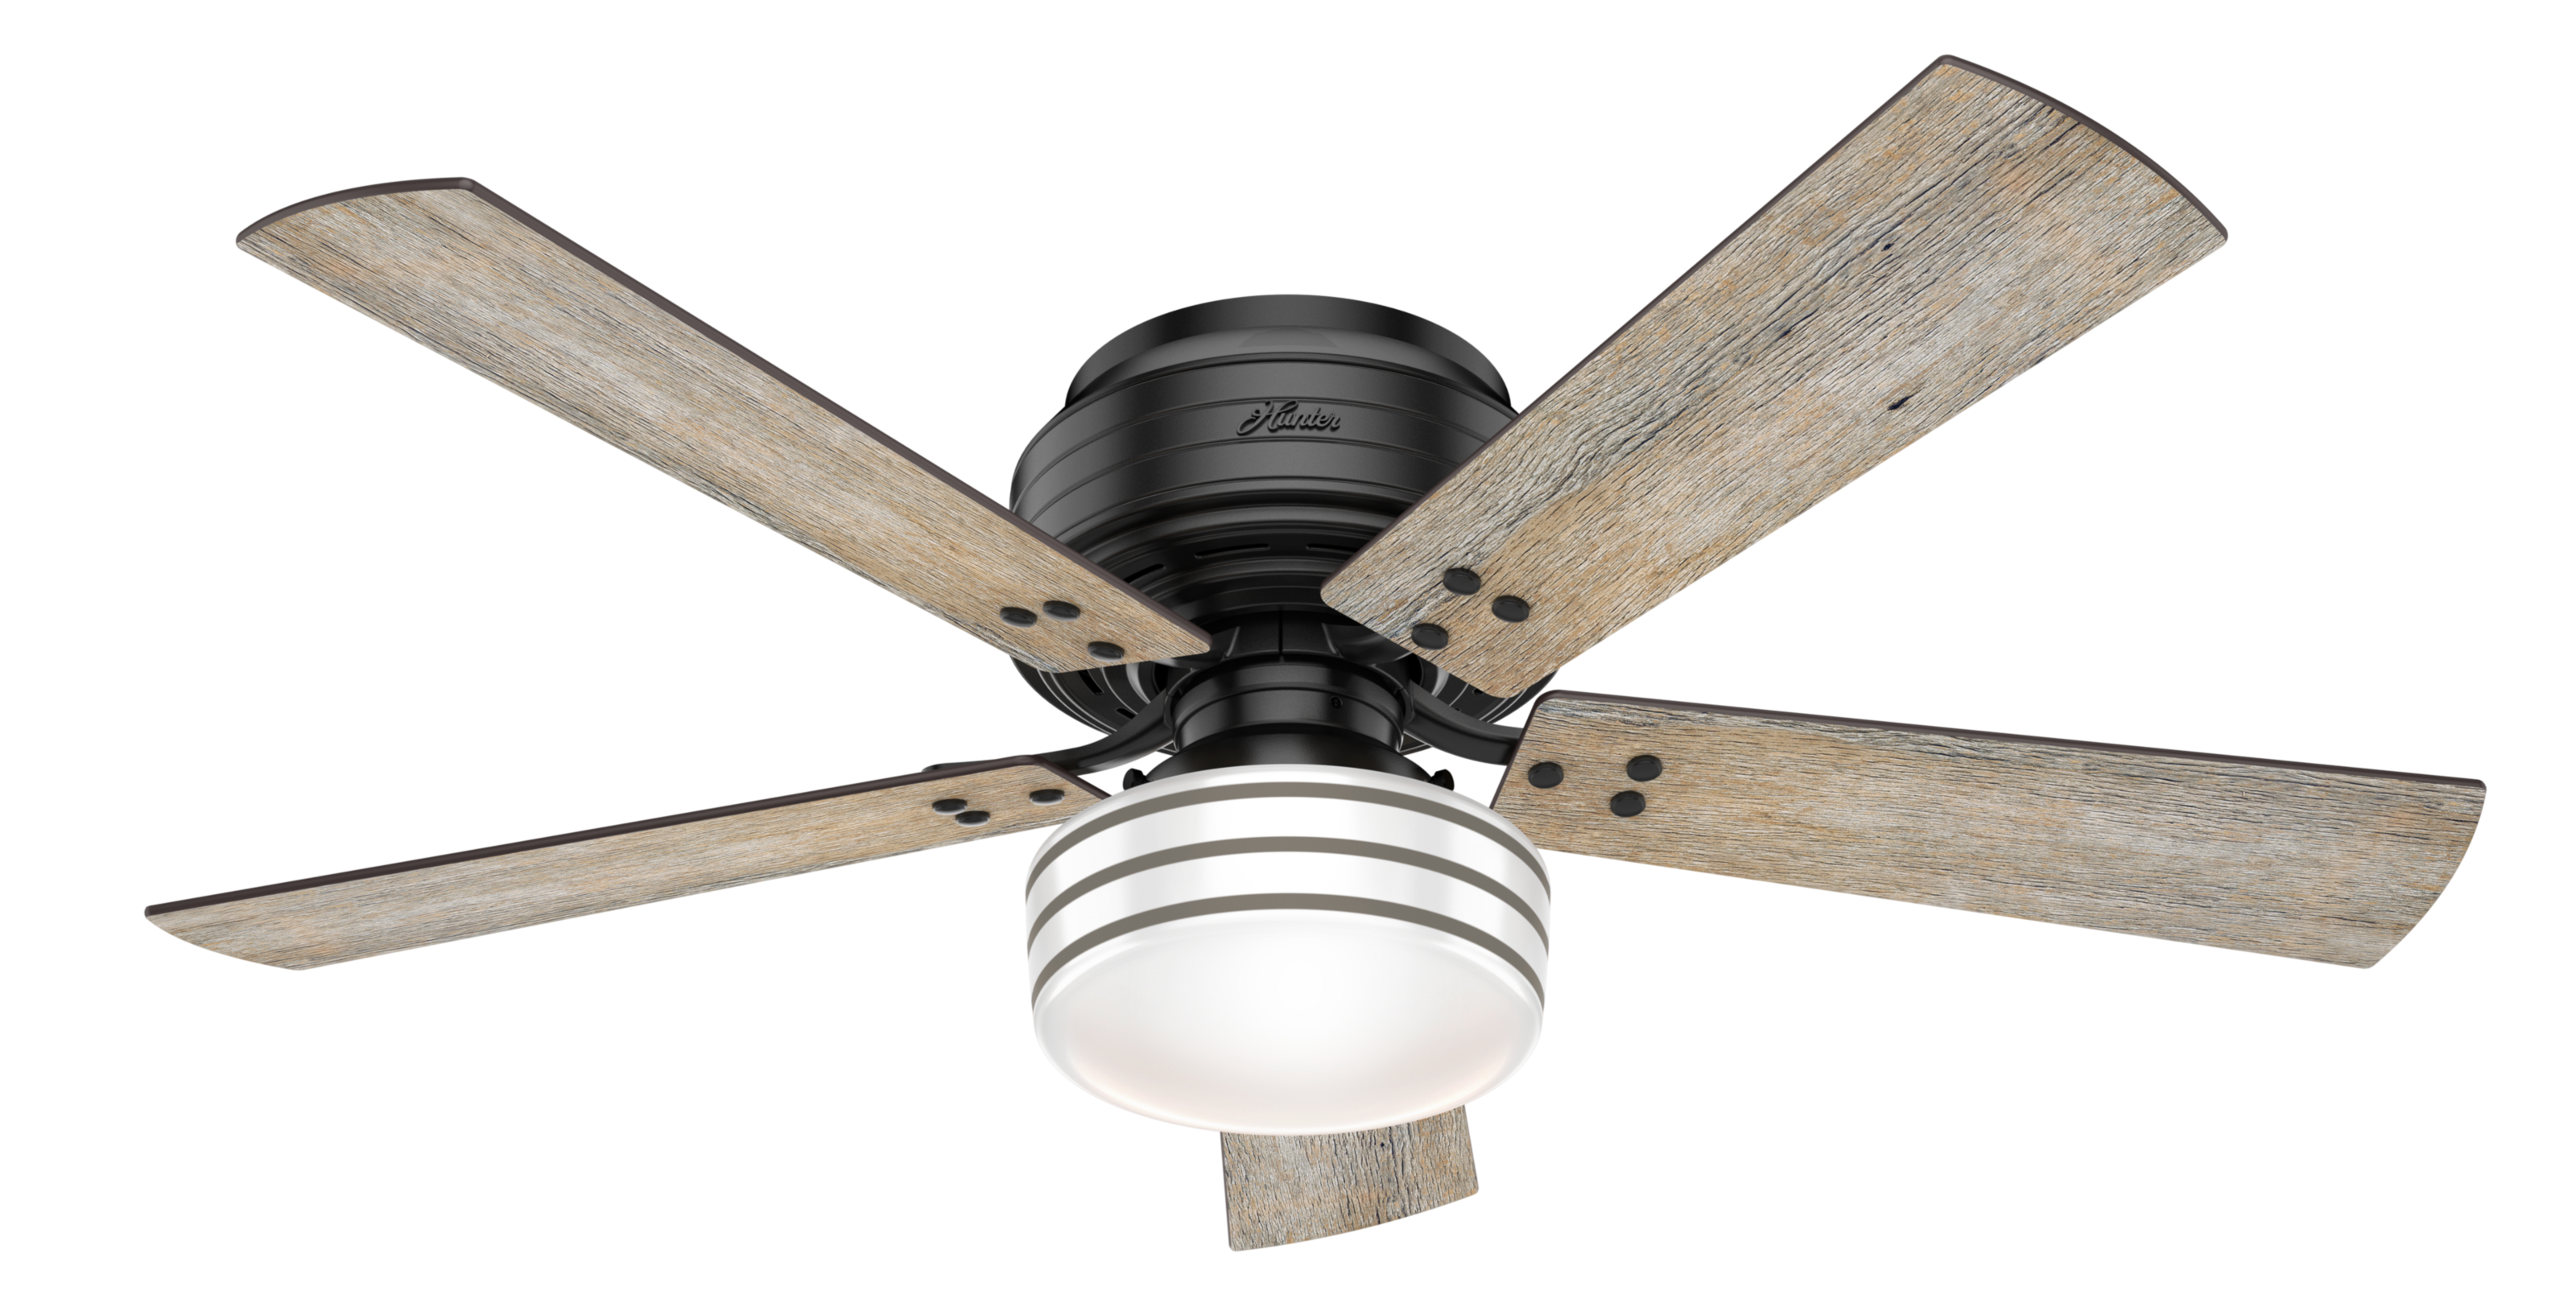 Miraculous Hunter Cedar Key Low Profile 52 Indoor Outdoor Ceiling Fan In Matte Black Download Free Architecture Designs Scobabritishbridgeorg